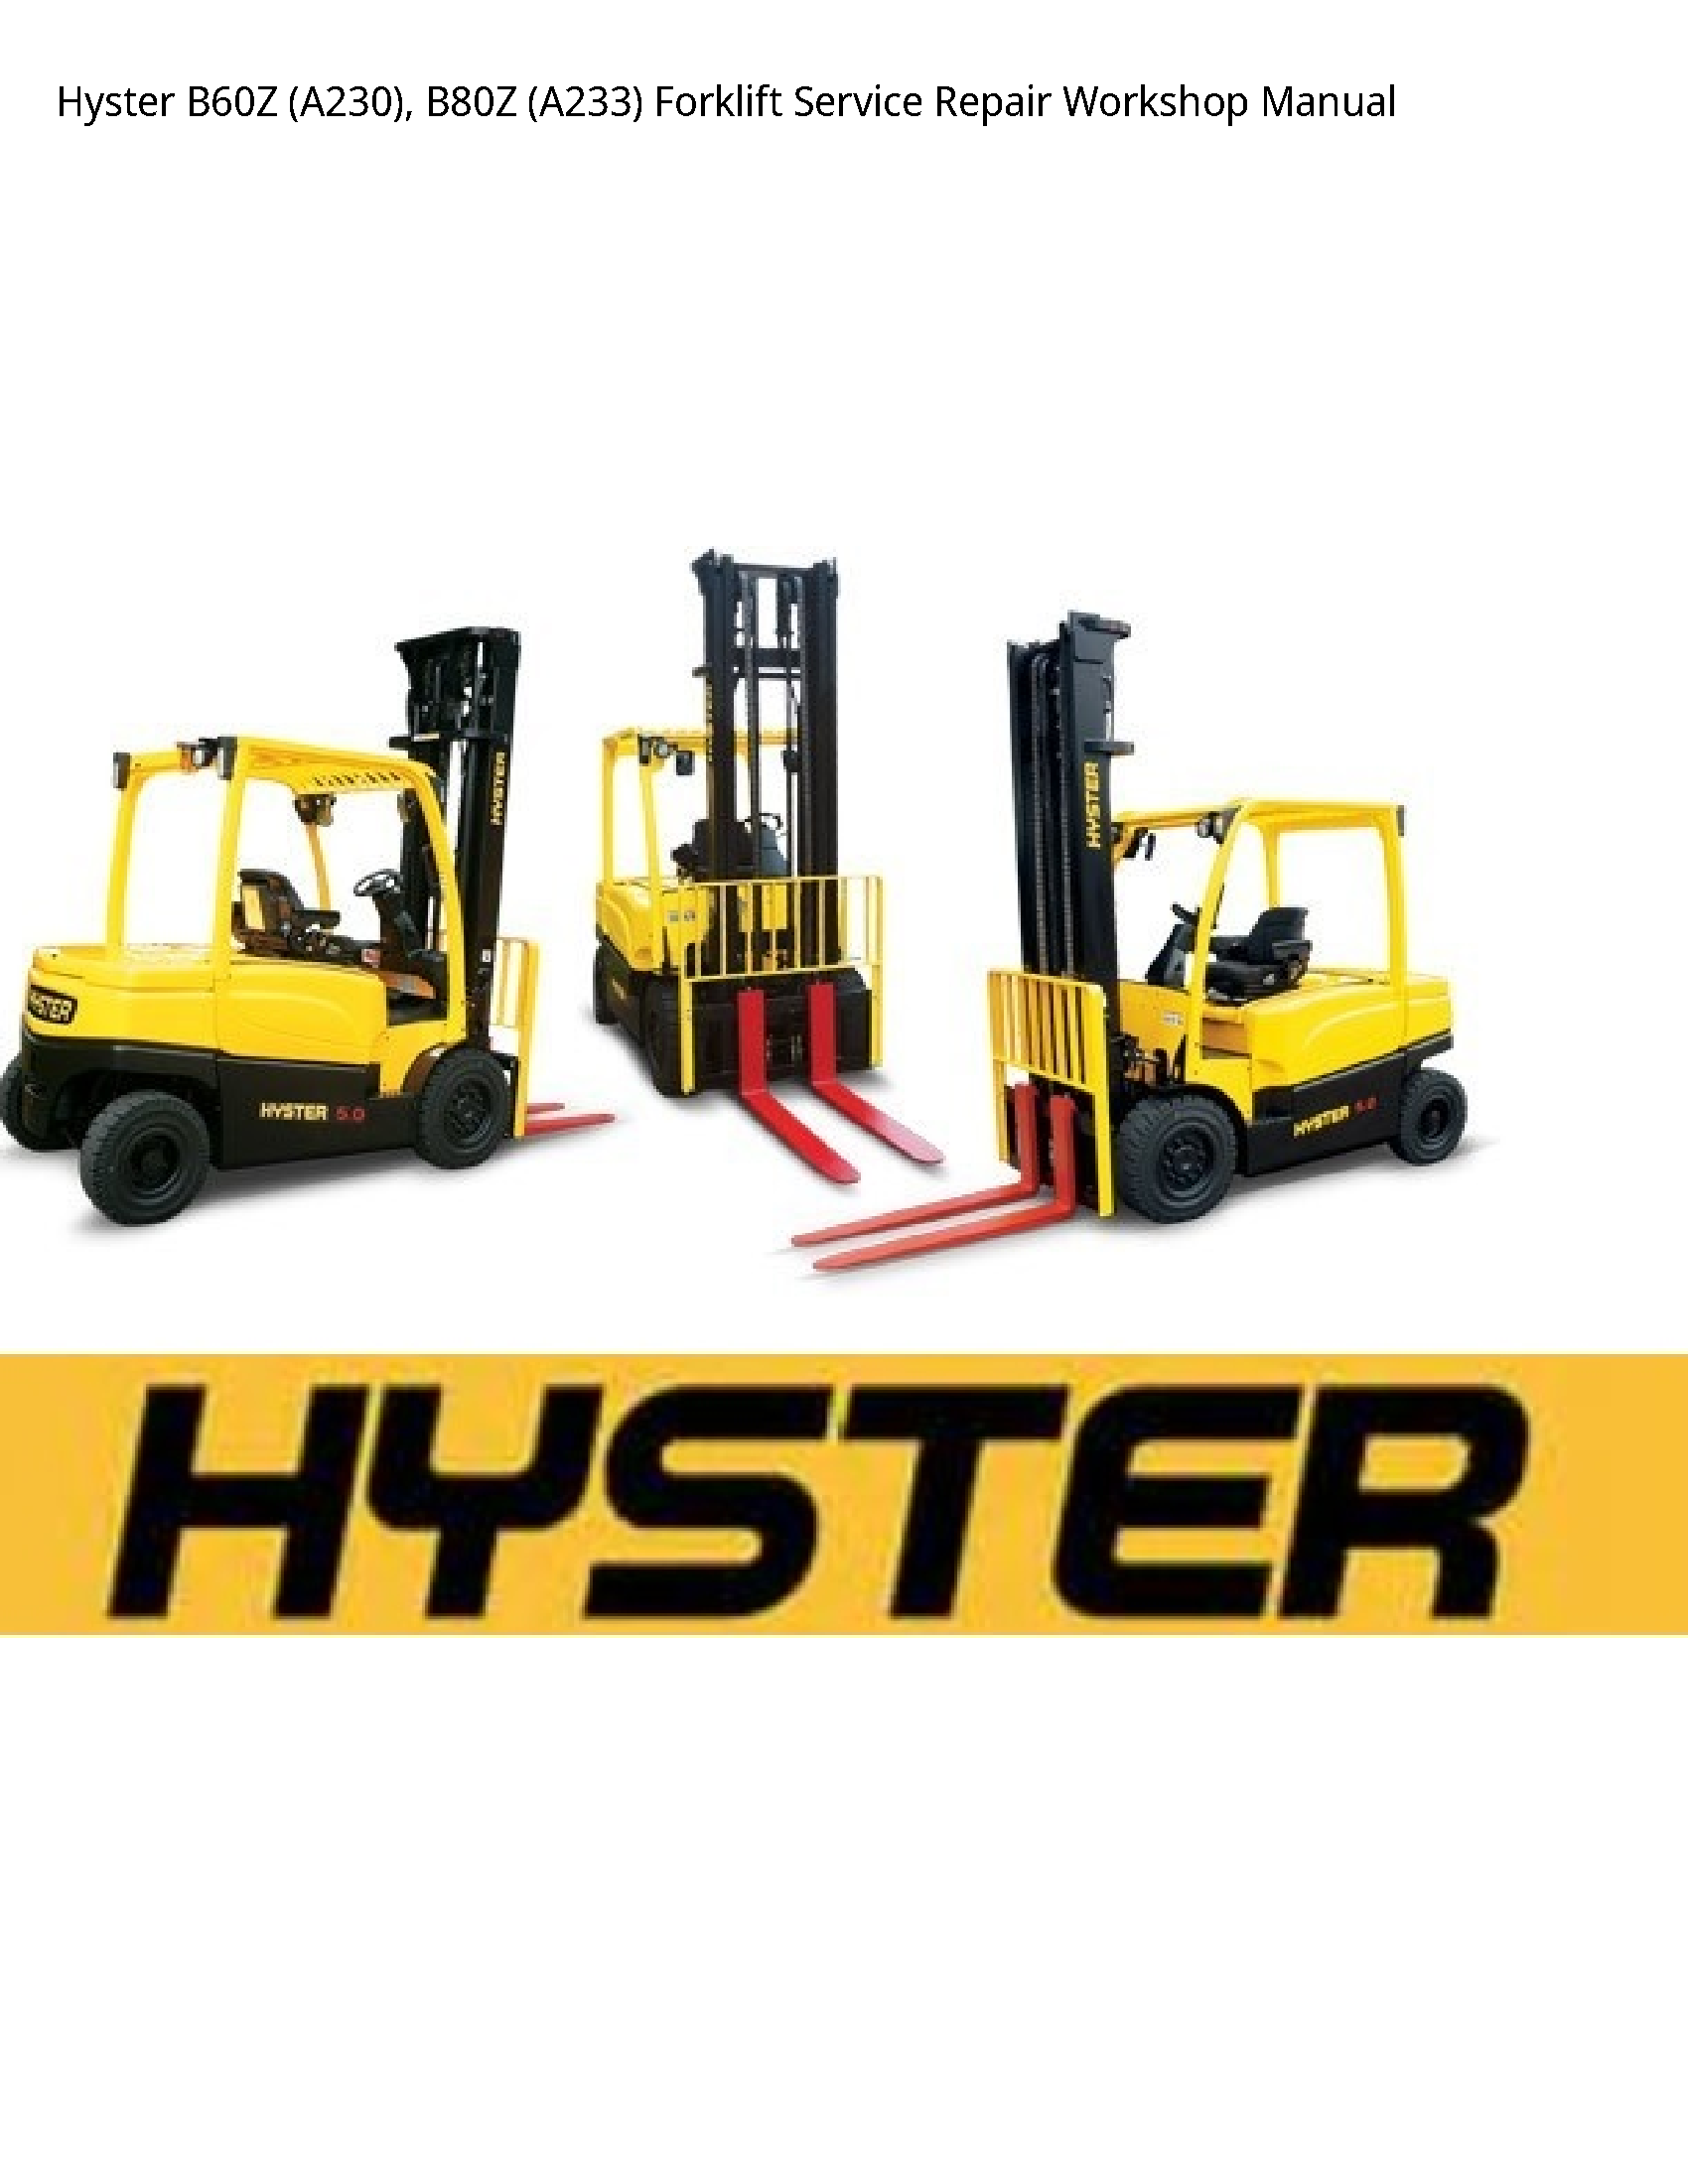 Hyster B60Z Forklift manual